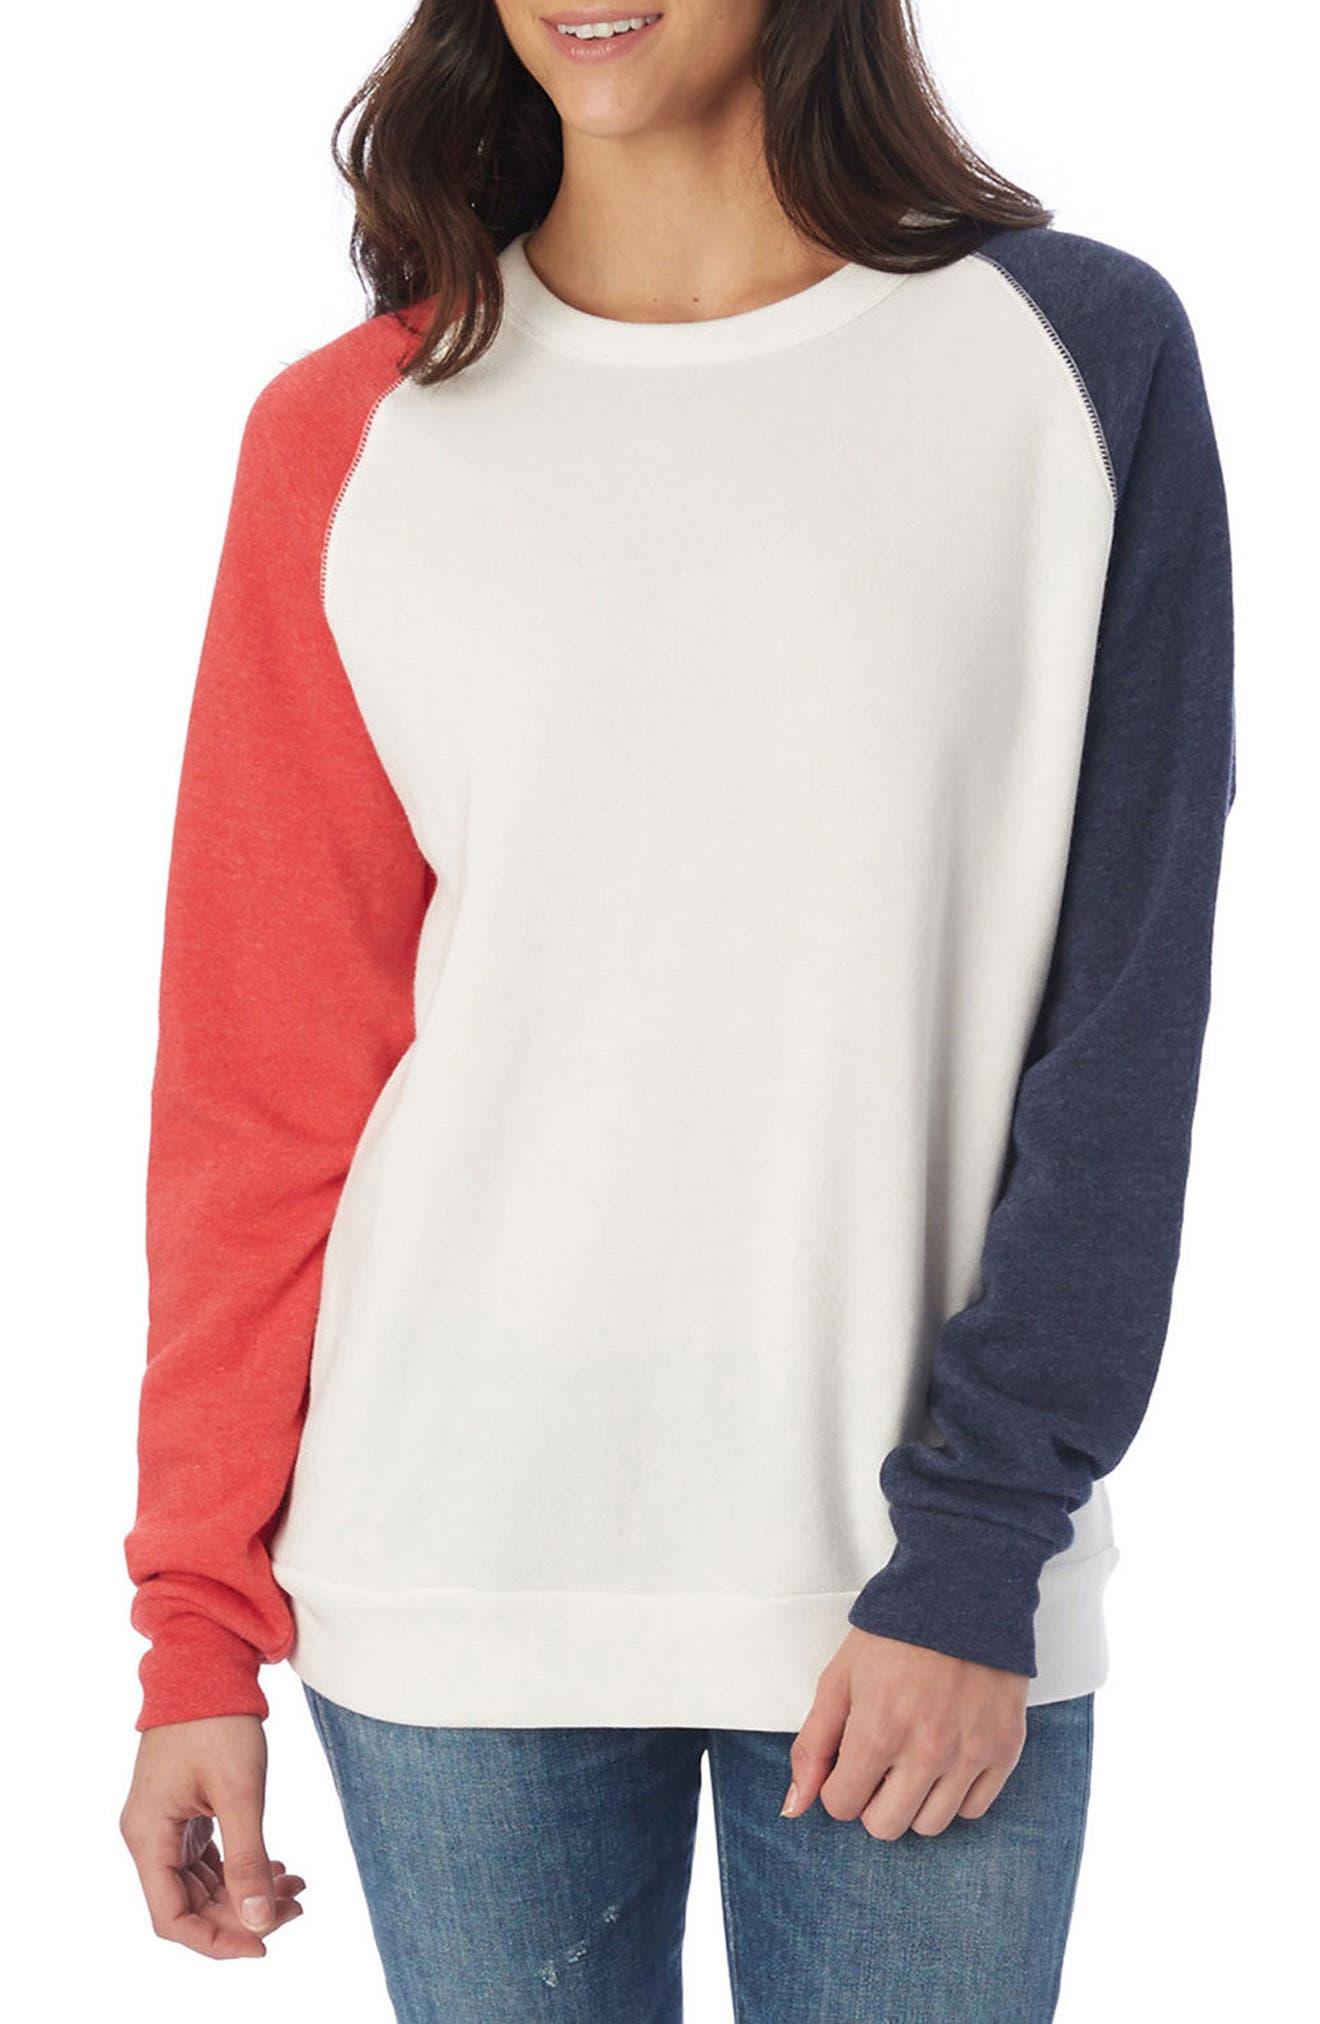 USA Champ Sweatshirt,                             Main thumbnail 1, color,                             Ivory/ True Red/ True Navy